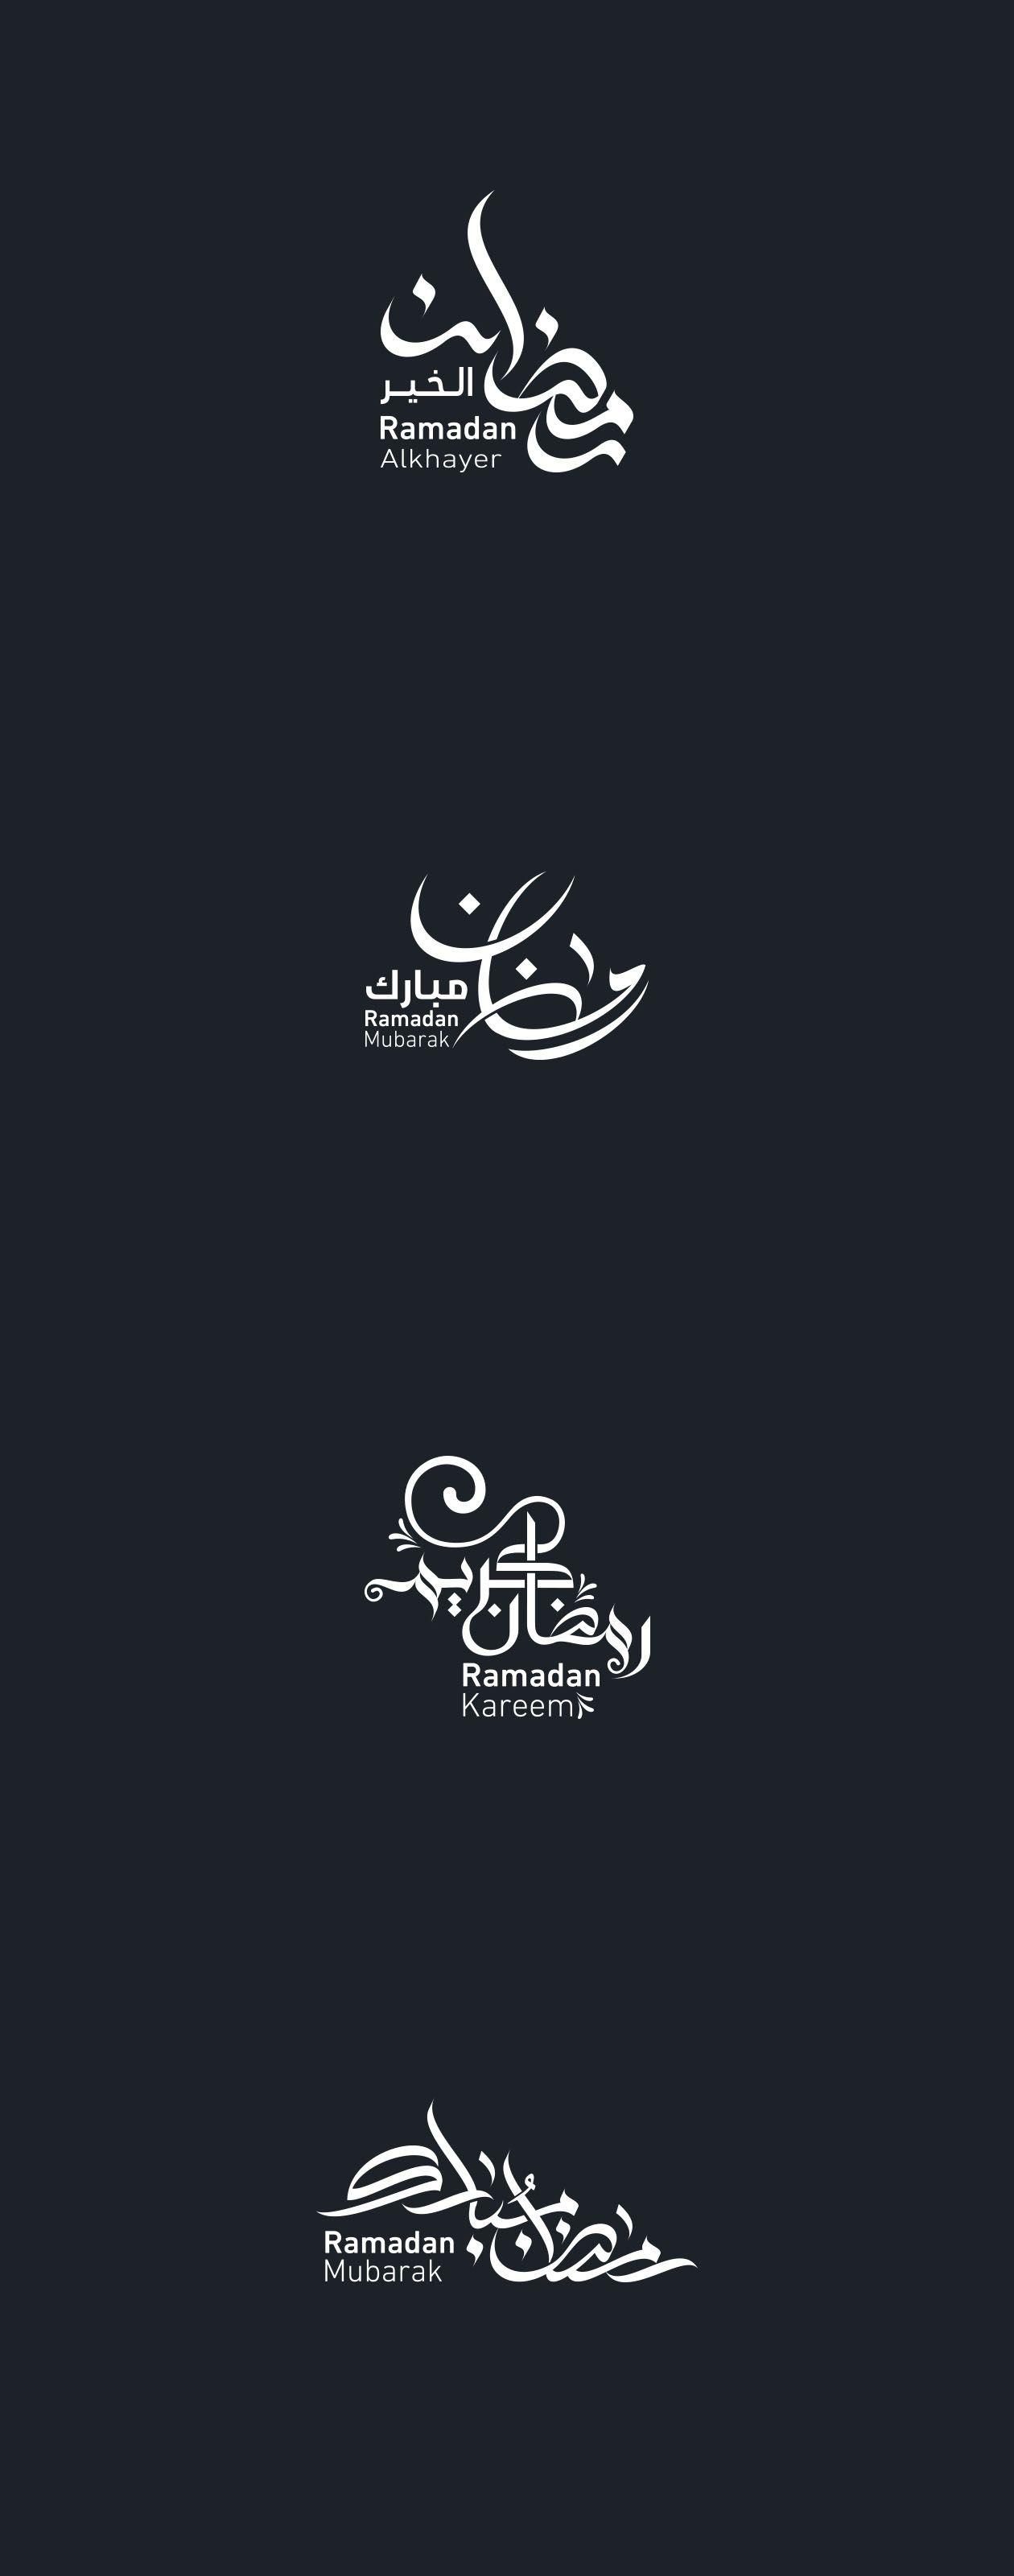 Ramadan greeting 2017 1438